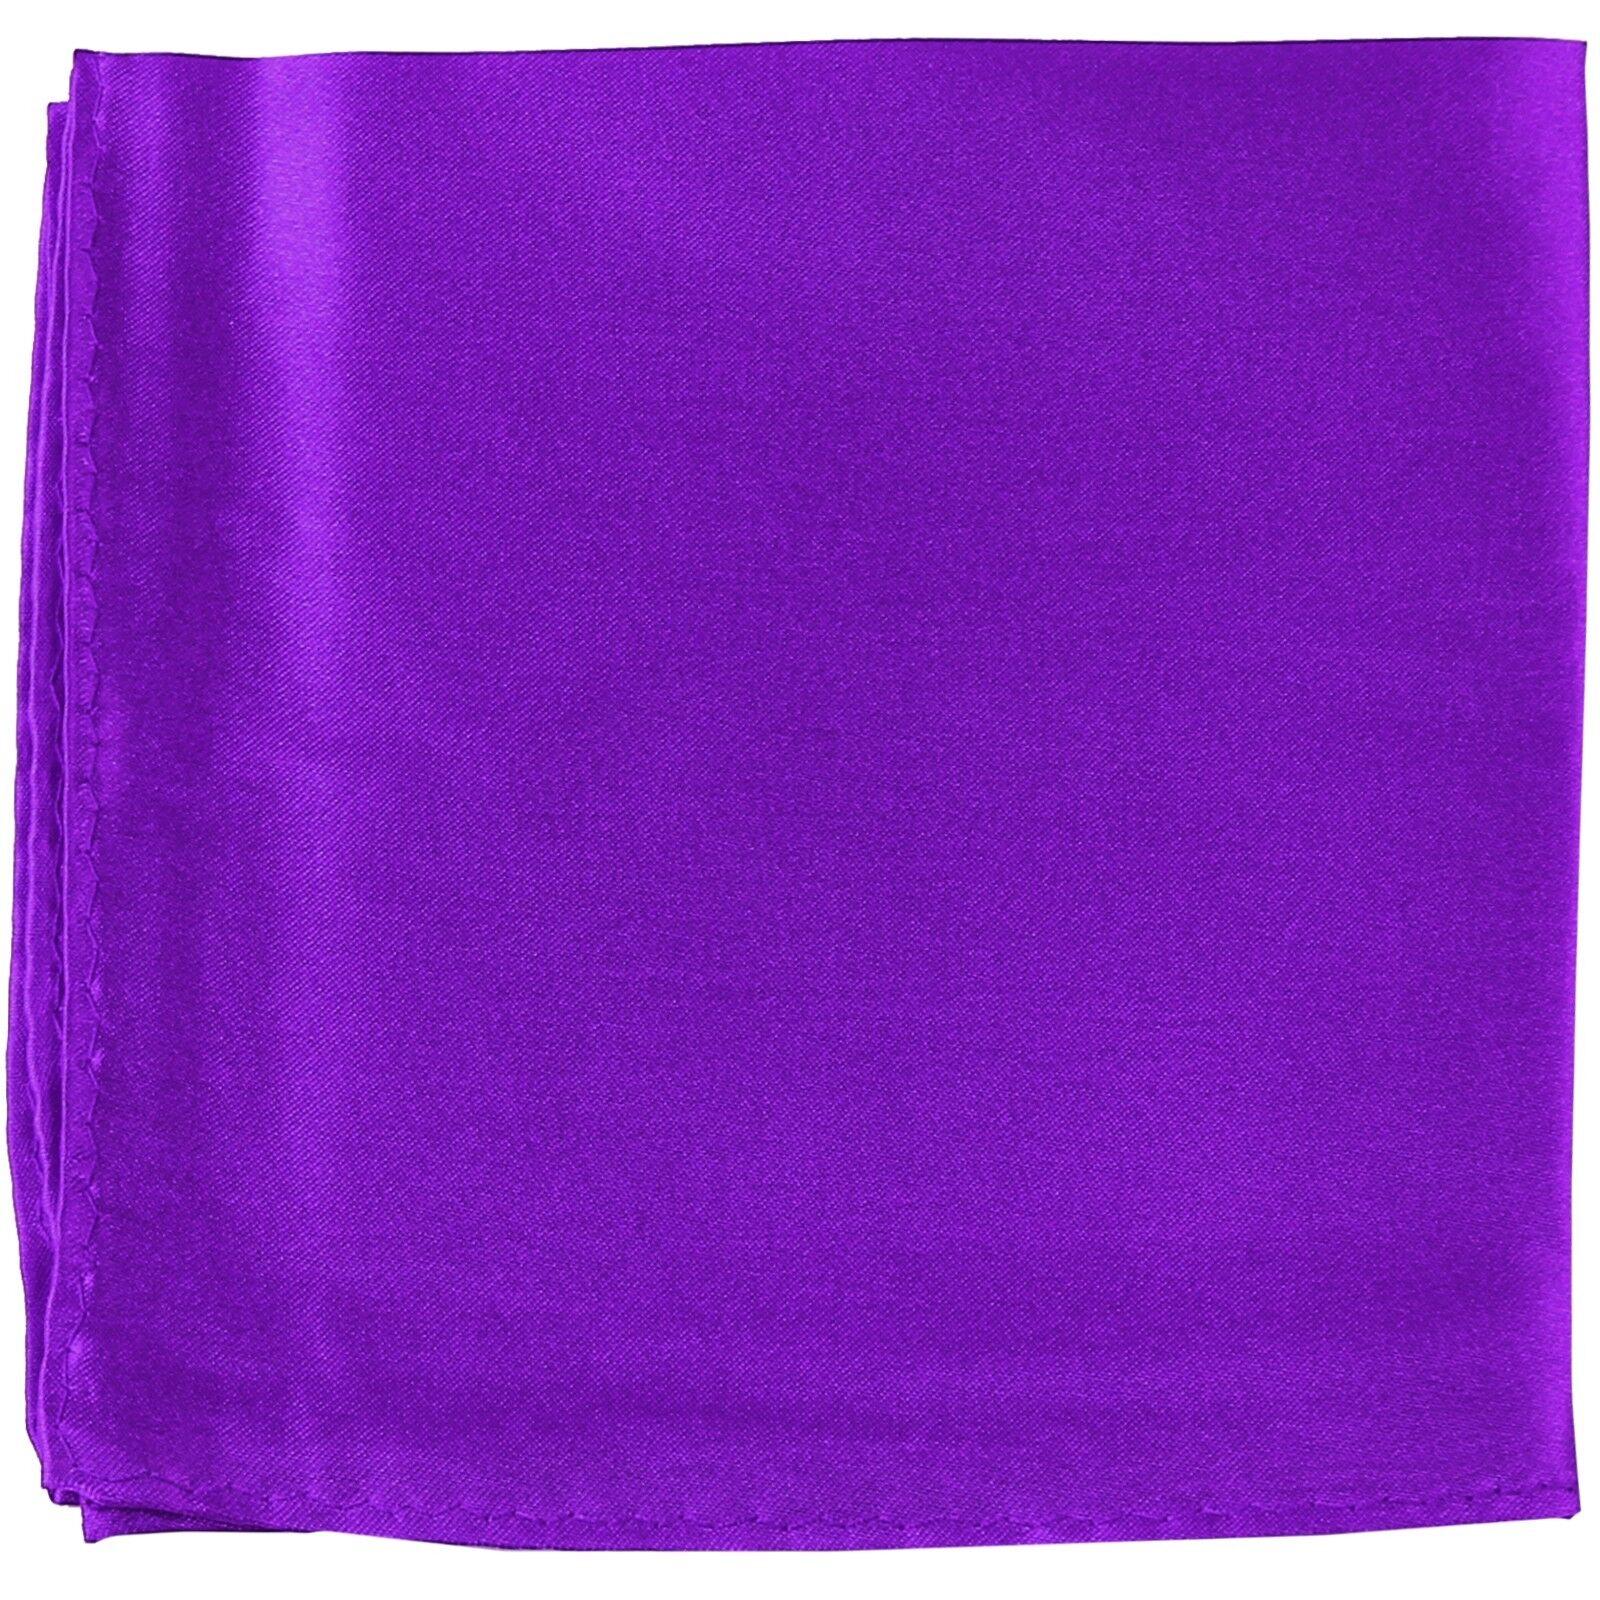 MANZO Men's Polyester Shiny Finish Pocket Square Hankie Only Purple